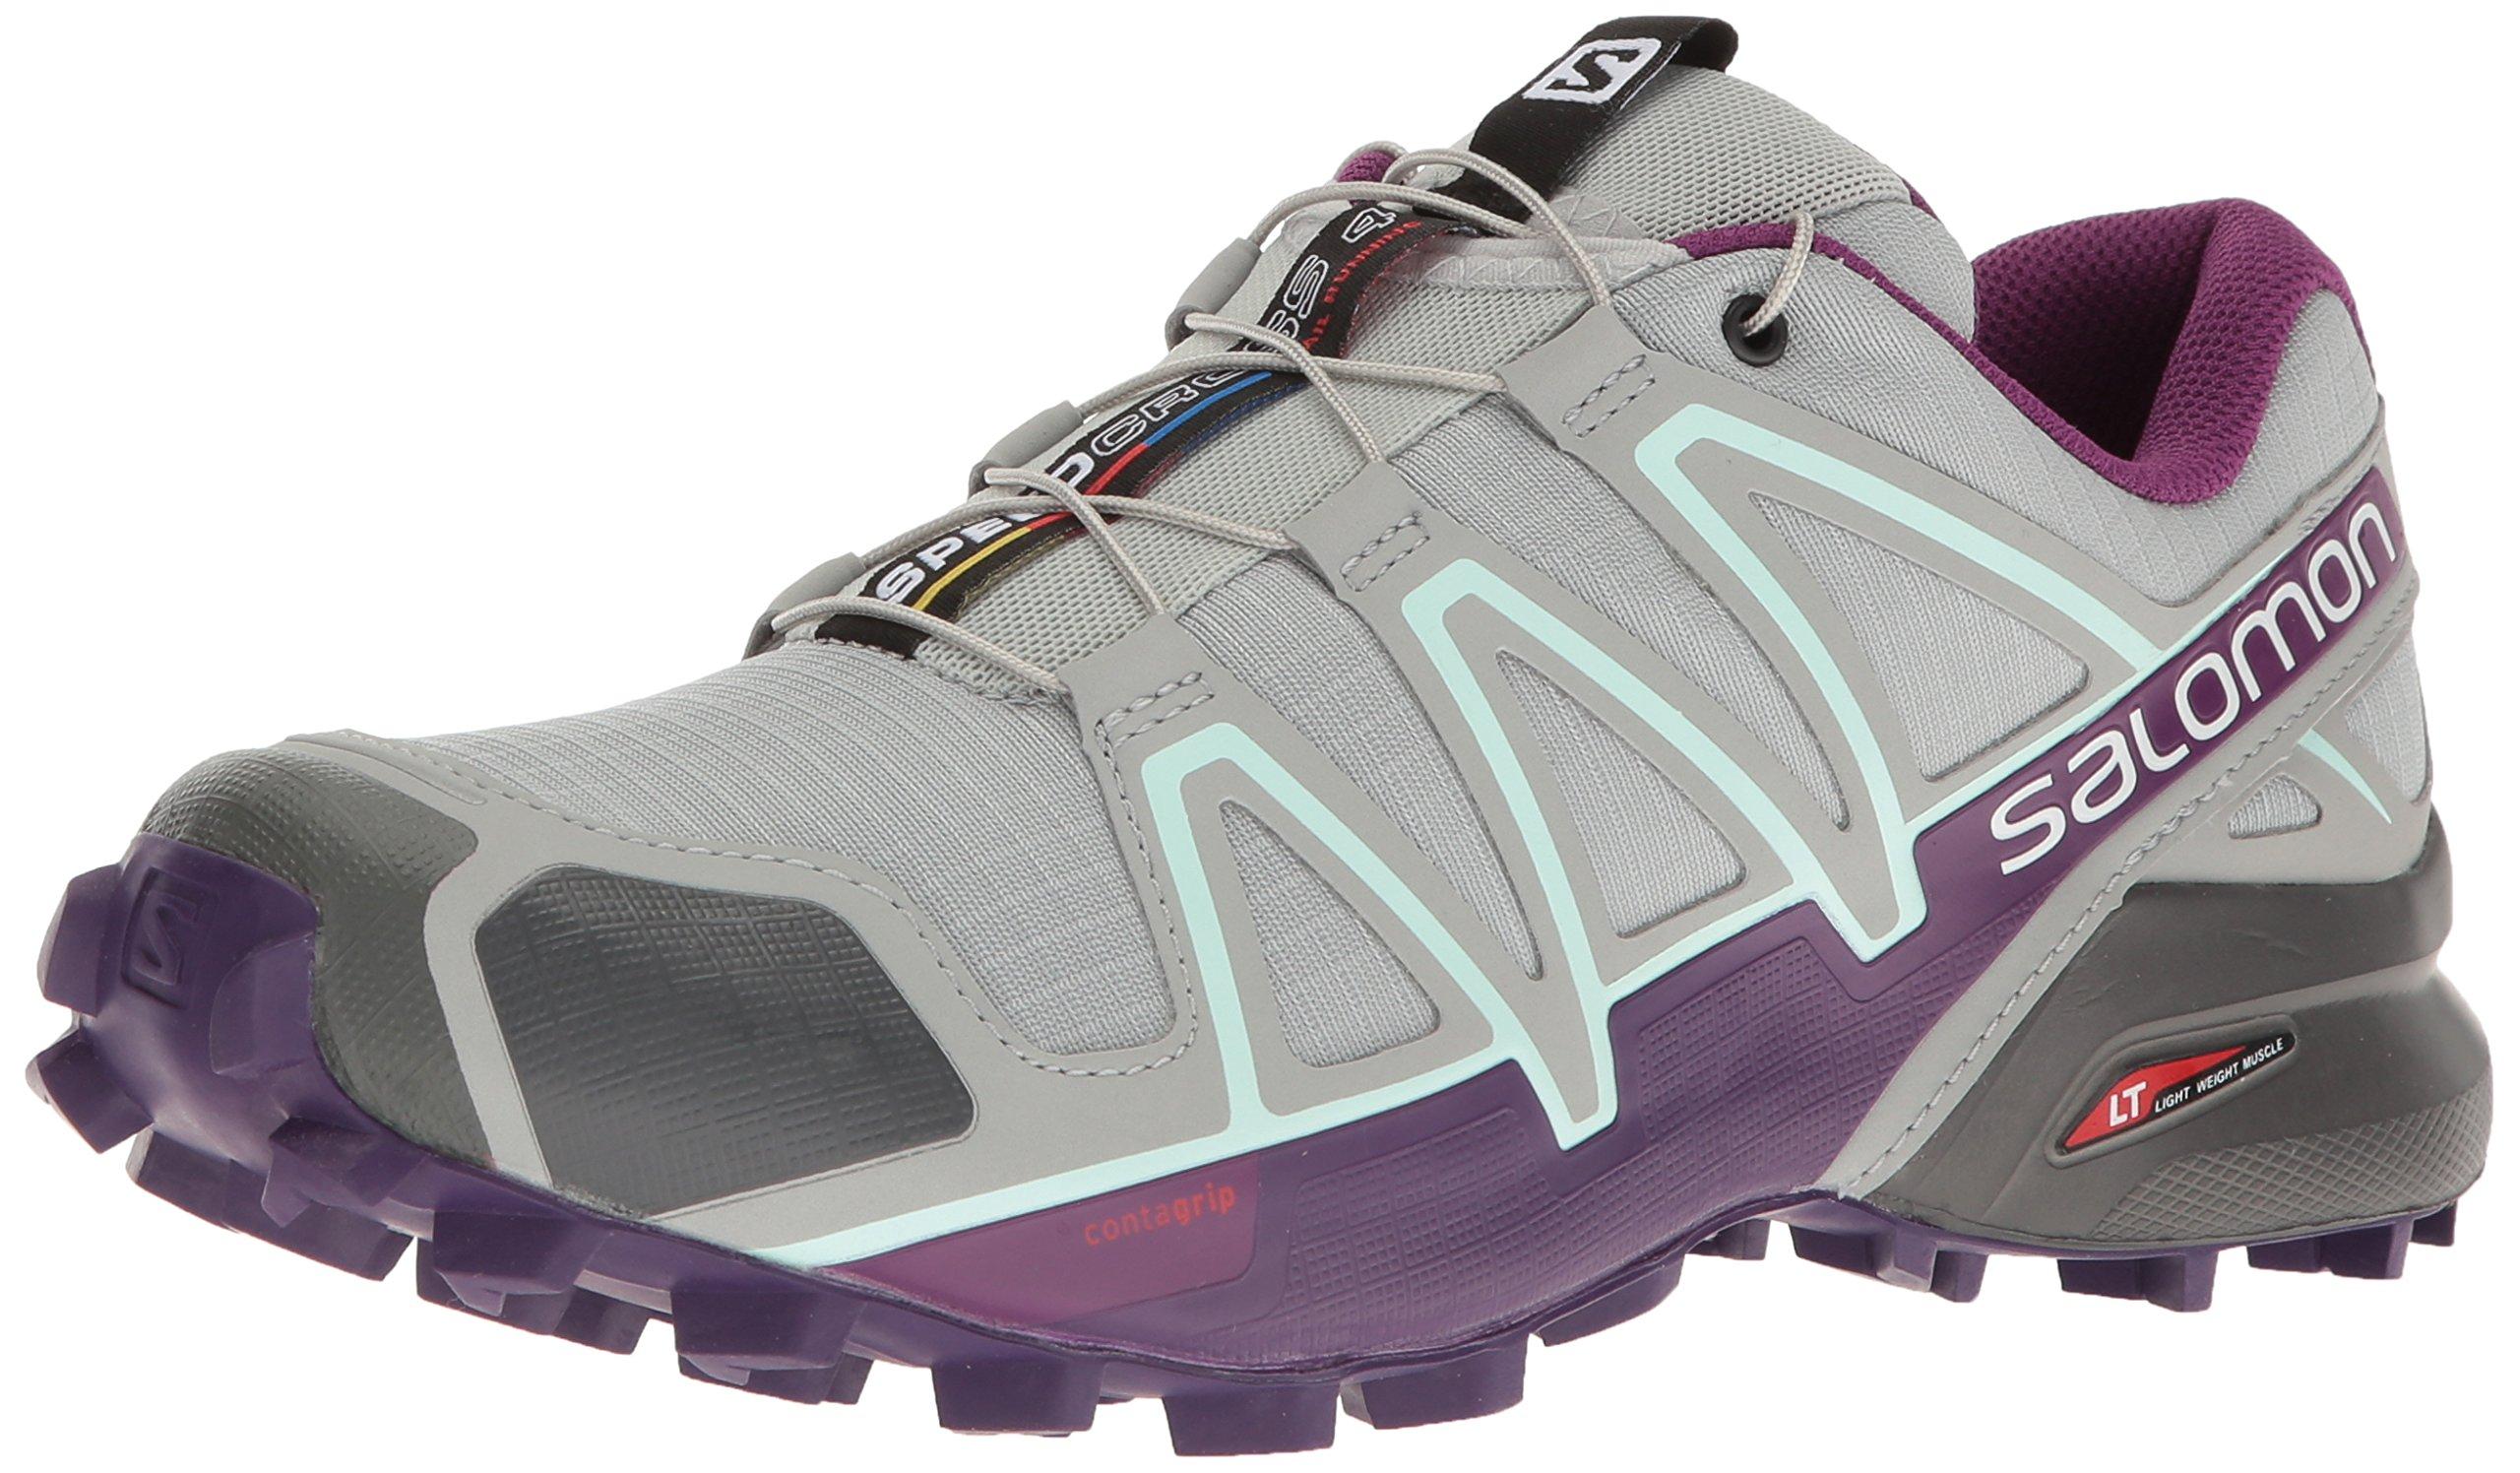 Salomon Women's Speedcross 4 W Trail-Runners, Quarry, 10.5 M US